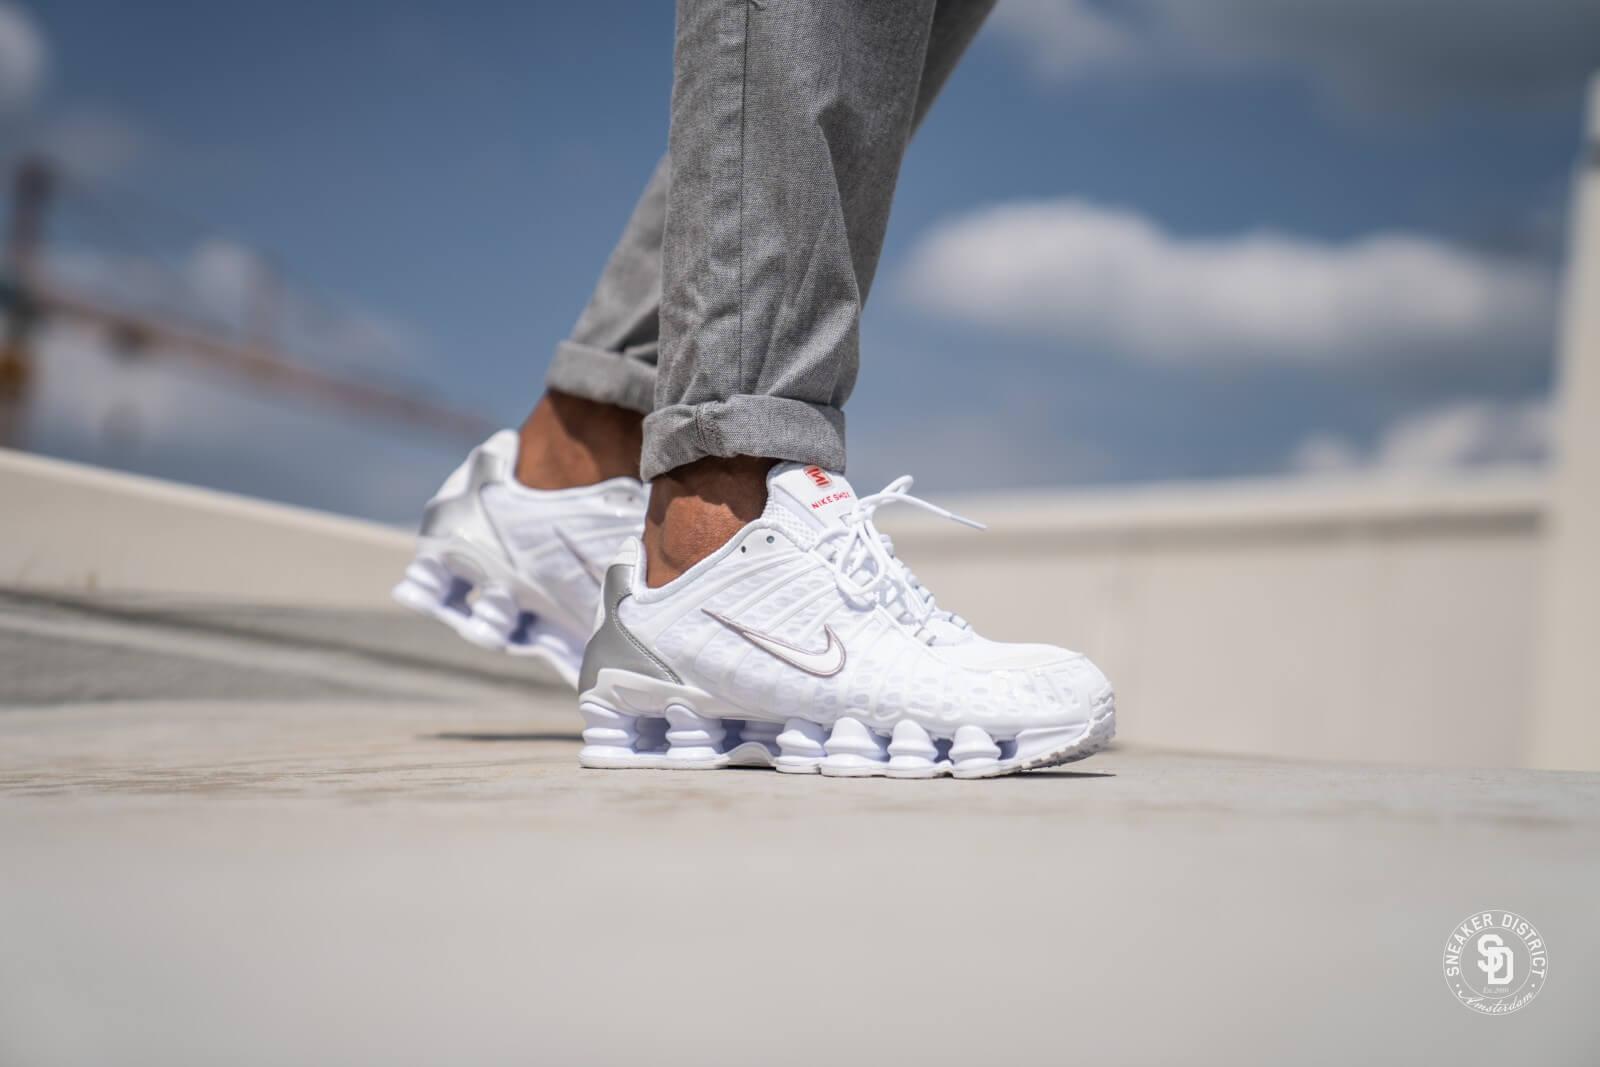 Nike Shox TL White/Metallic Silver